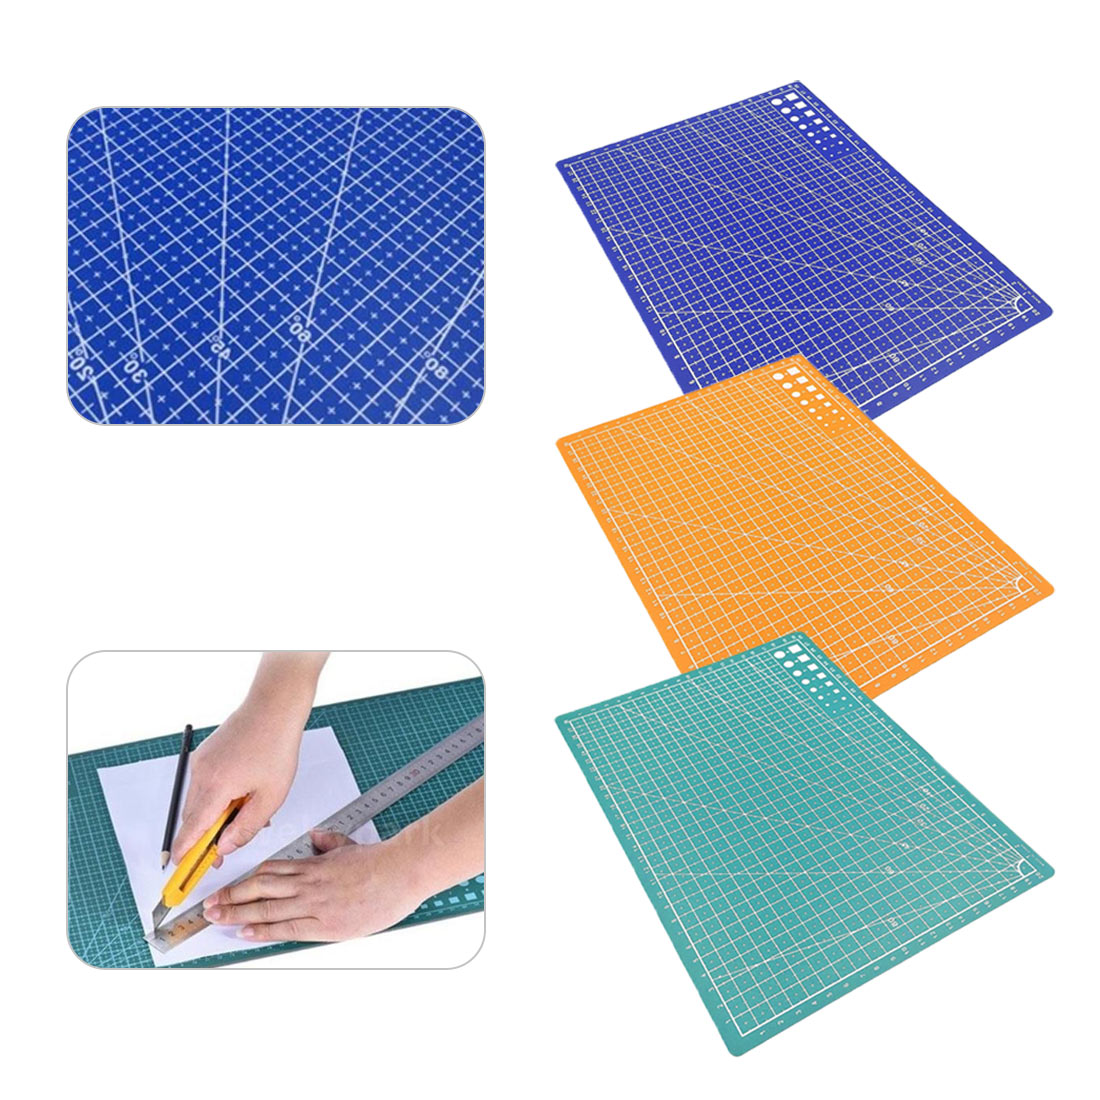 1PC30*20cm Grid Line Self-healing Cutting Pad Craft Card Cloth Leather Cardboard Sewing Tool PP Mat Pad Patchwork Cut Pad